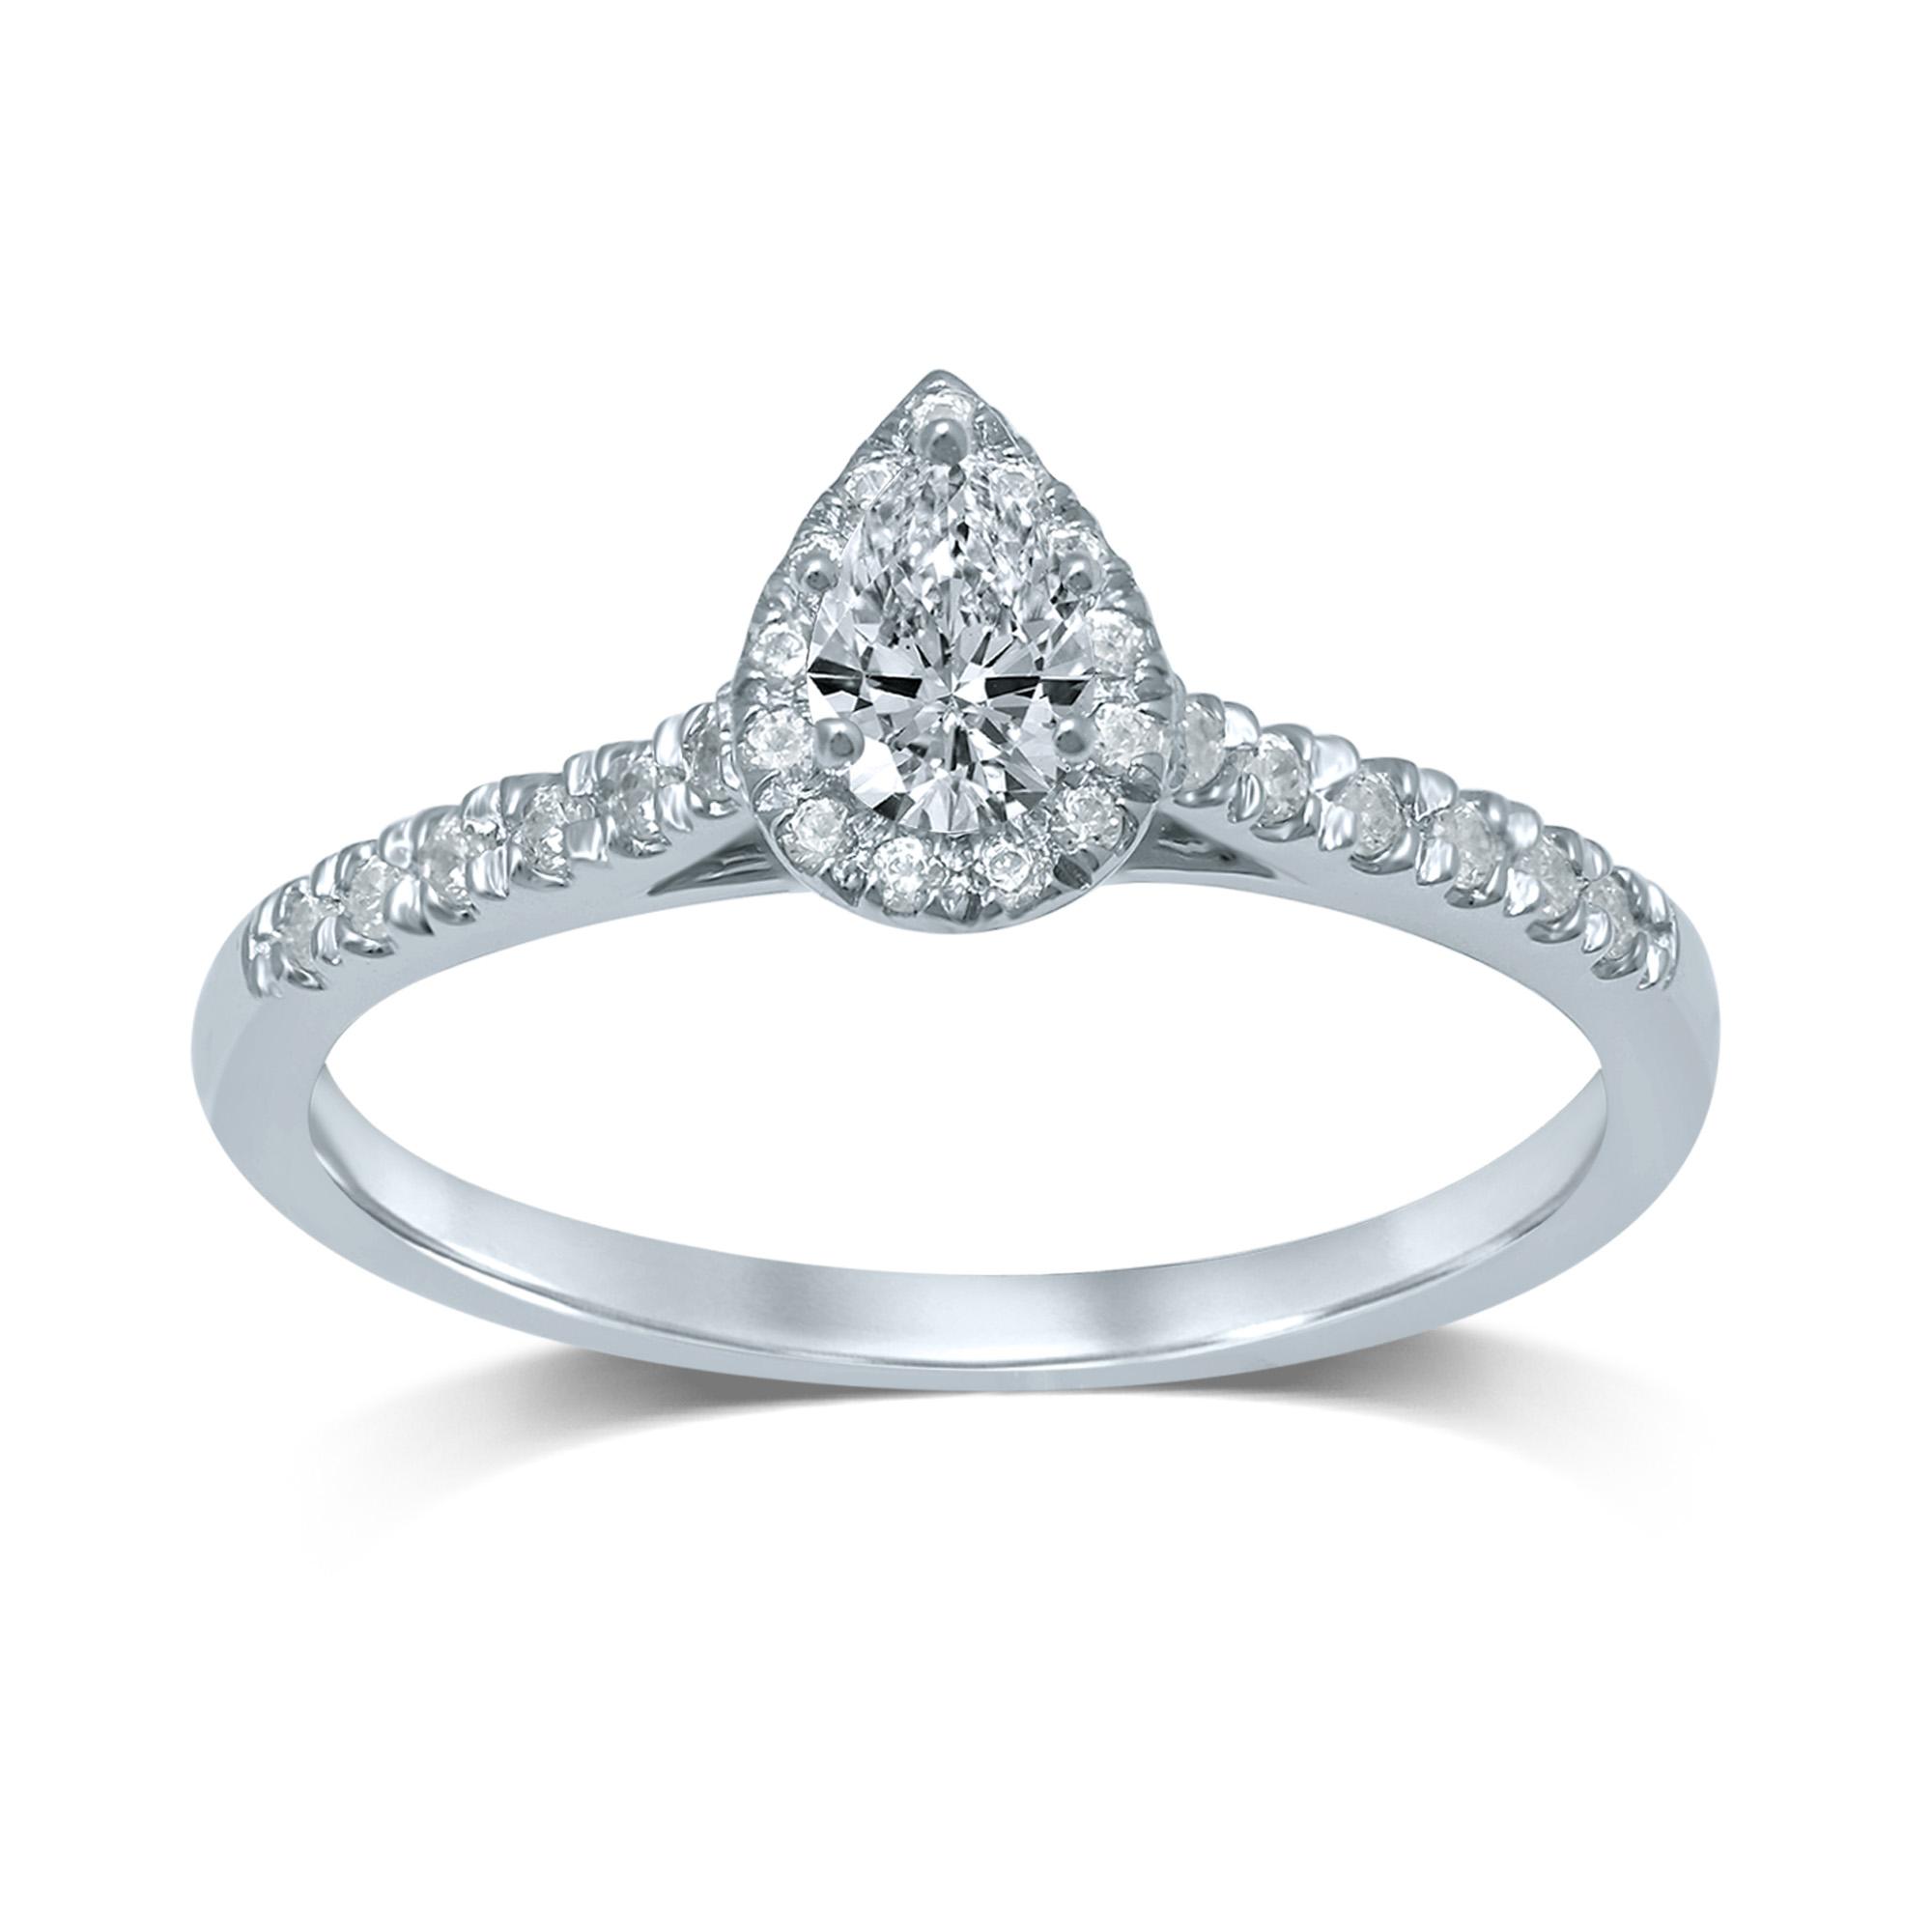 18ct White Gold 0.45 Carat Pear Diamond Halo Ring